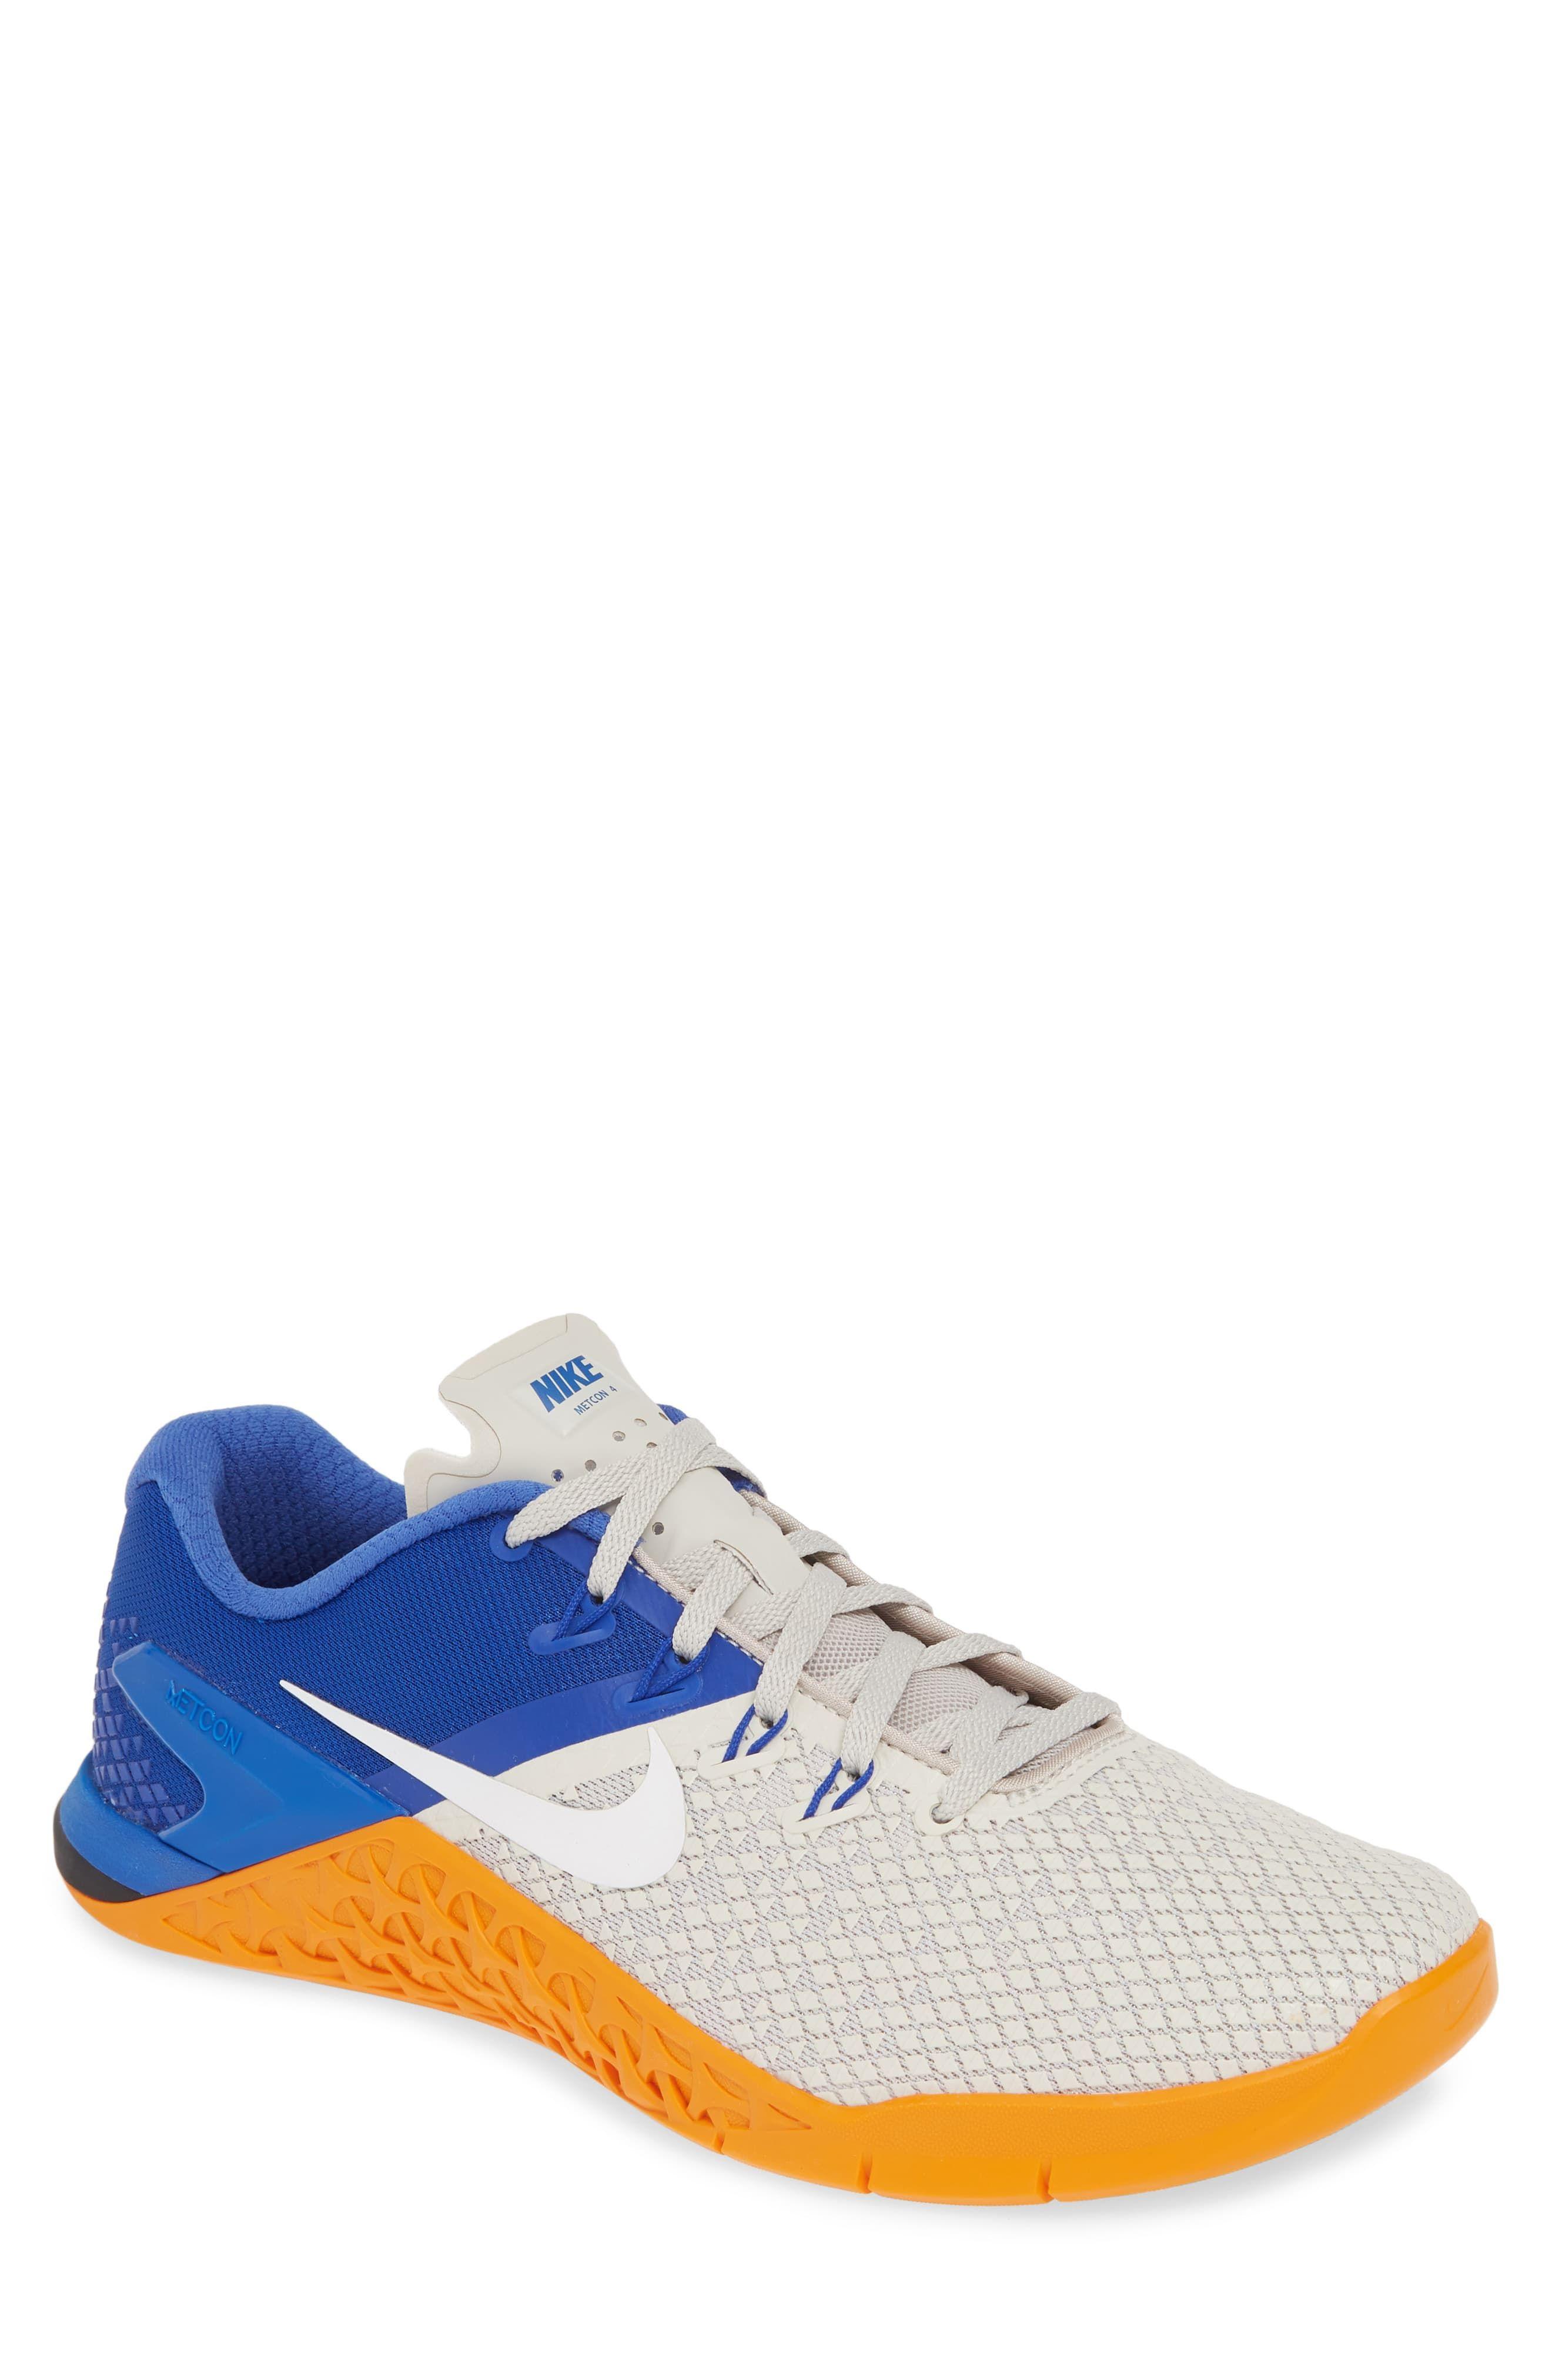 d2ed5f3046f7c Men's Nike Metcon 4 Xd Training Shoe, Size 8 M - White in 2019 ...